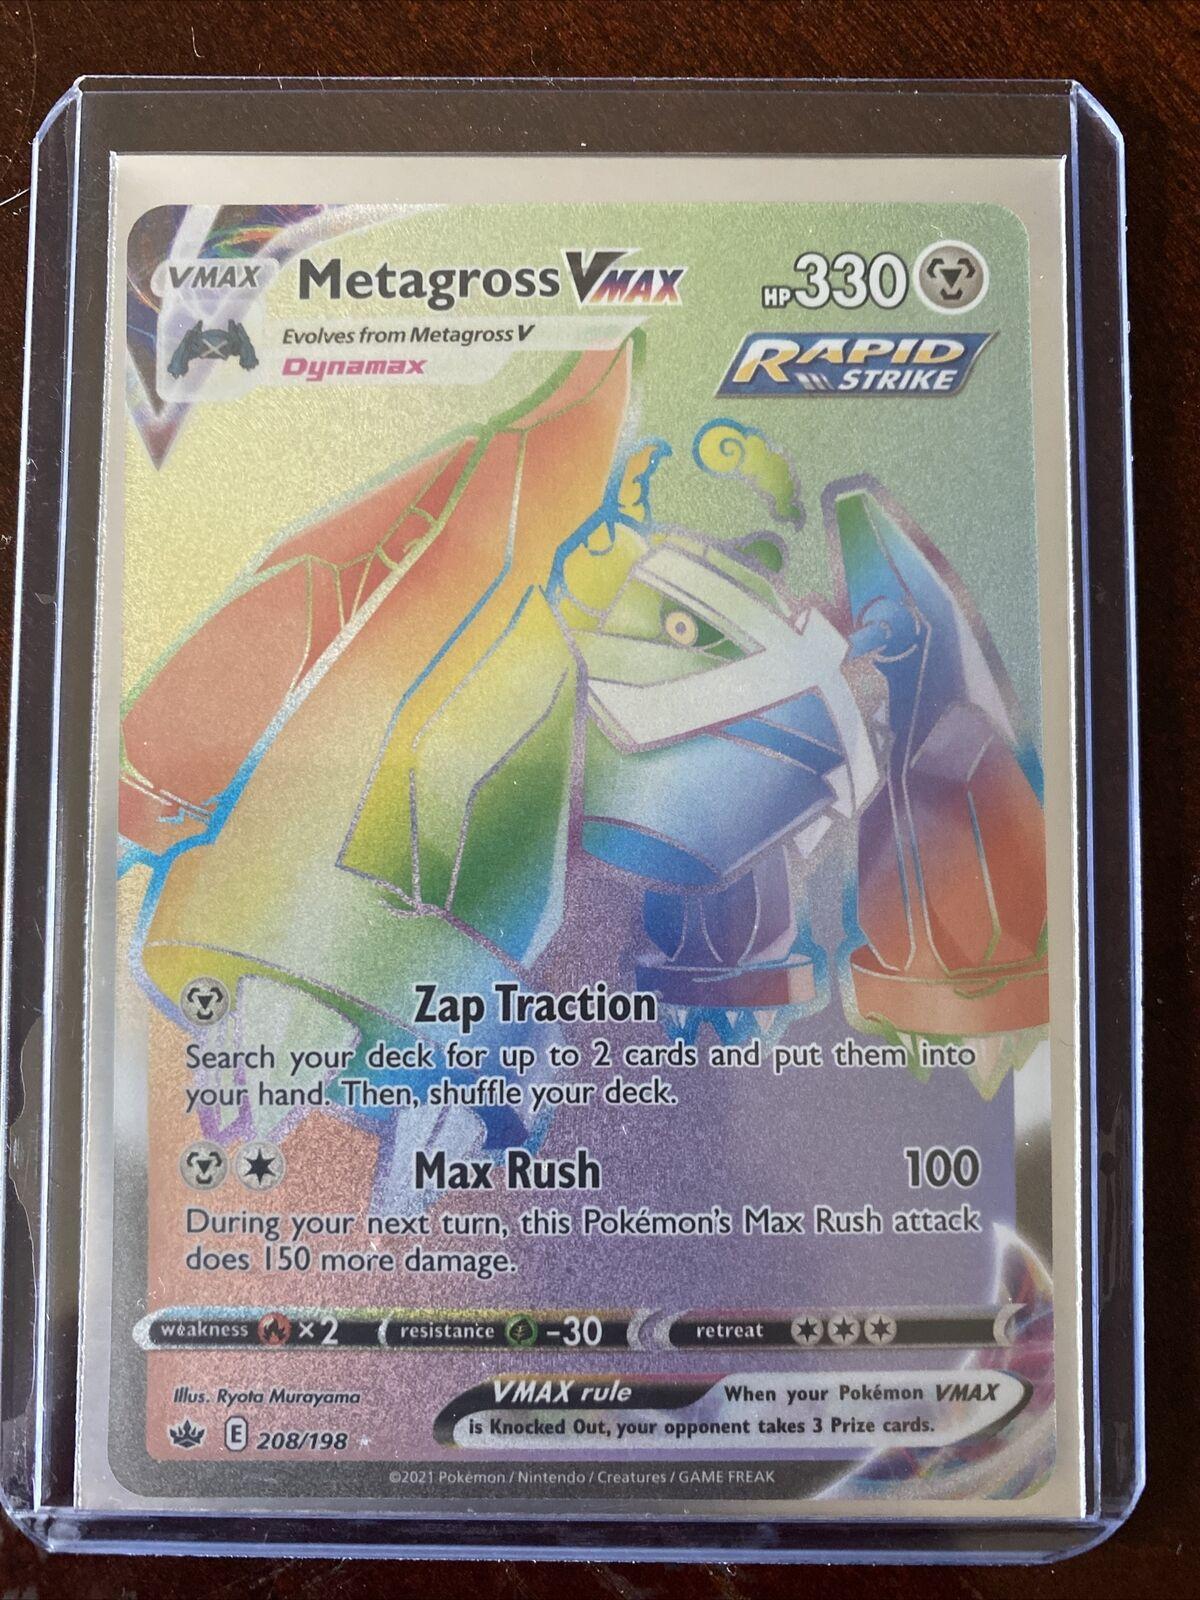 Metagross VMAX Pokemon Chilling Reign 208/198 Rainbow Secret Rare Nm/Mint - Image 1